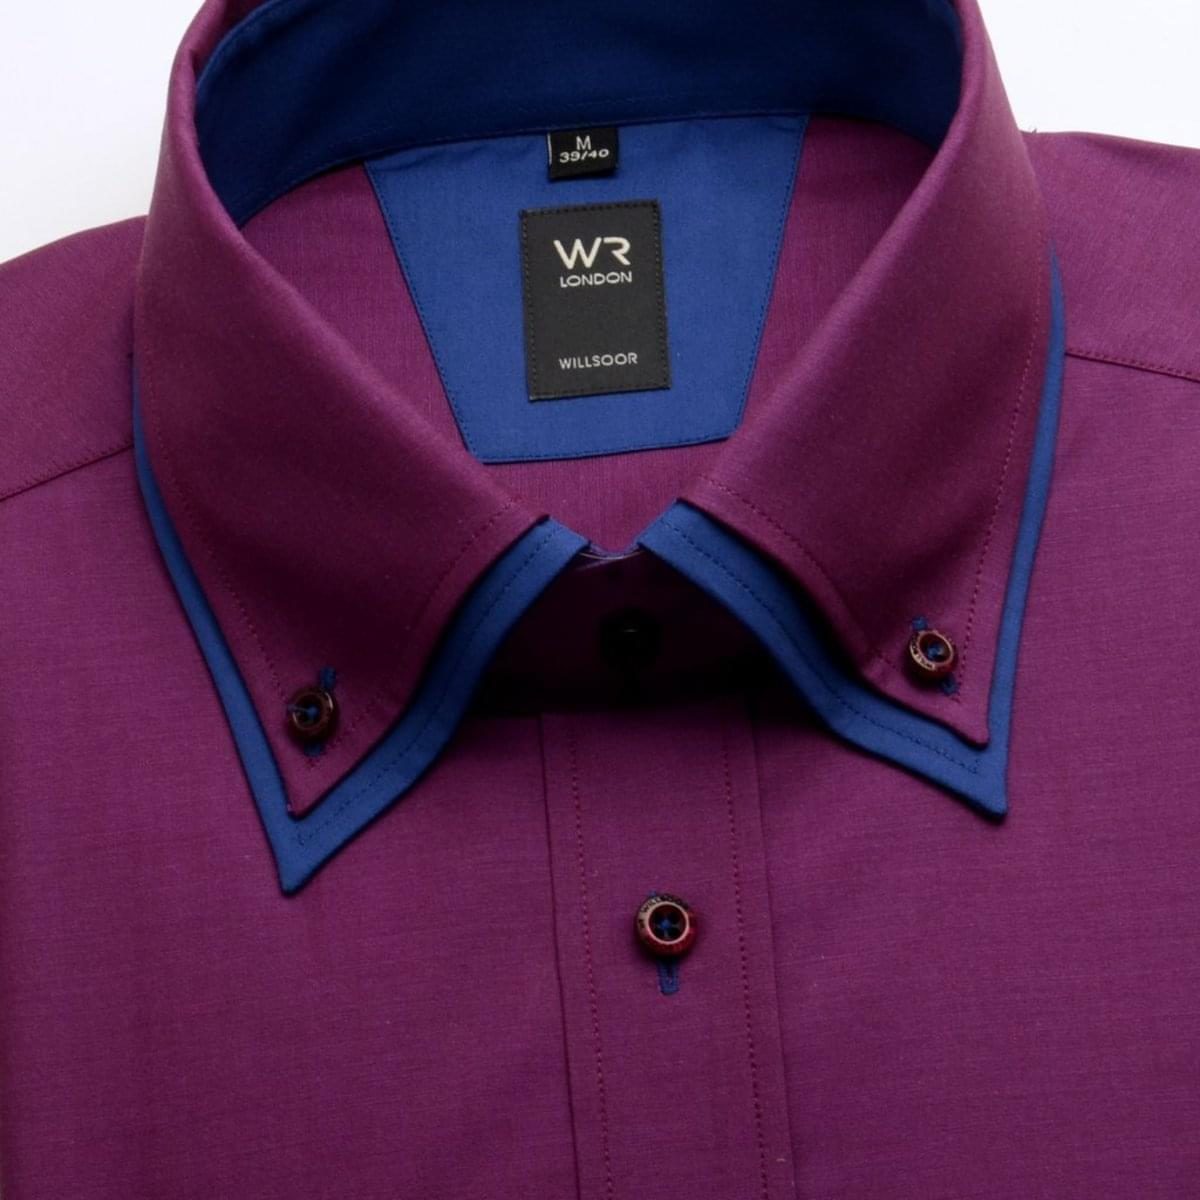 Willsoor Pánská košile WR London (výška 176-182) 1720 176-182 / XL (43/44)